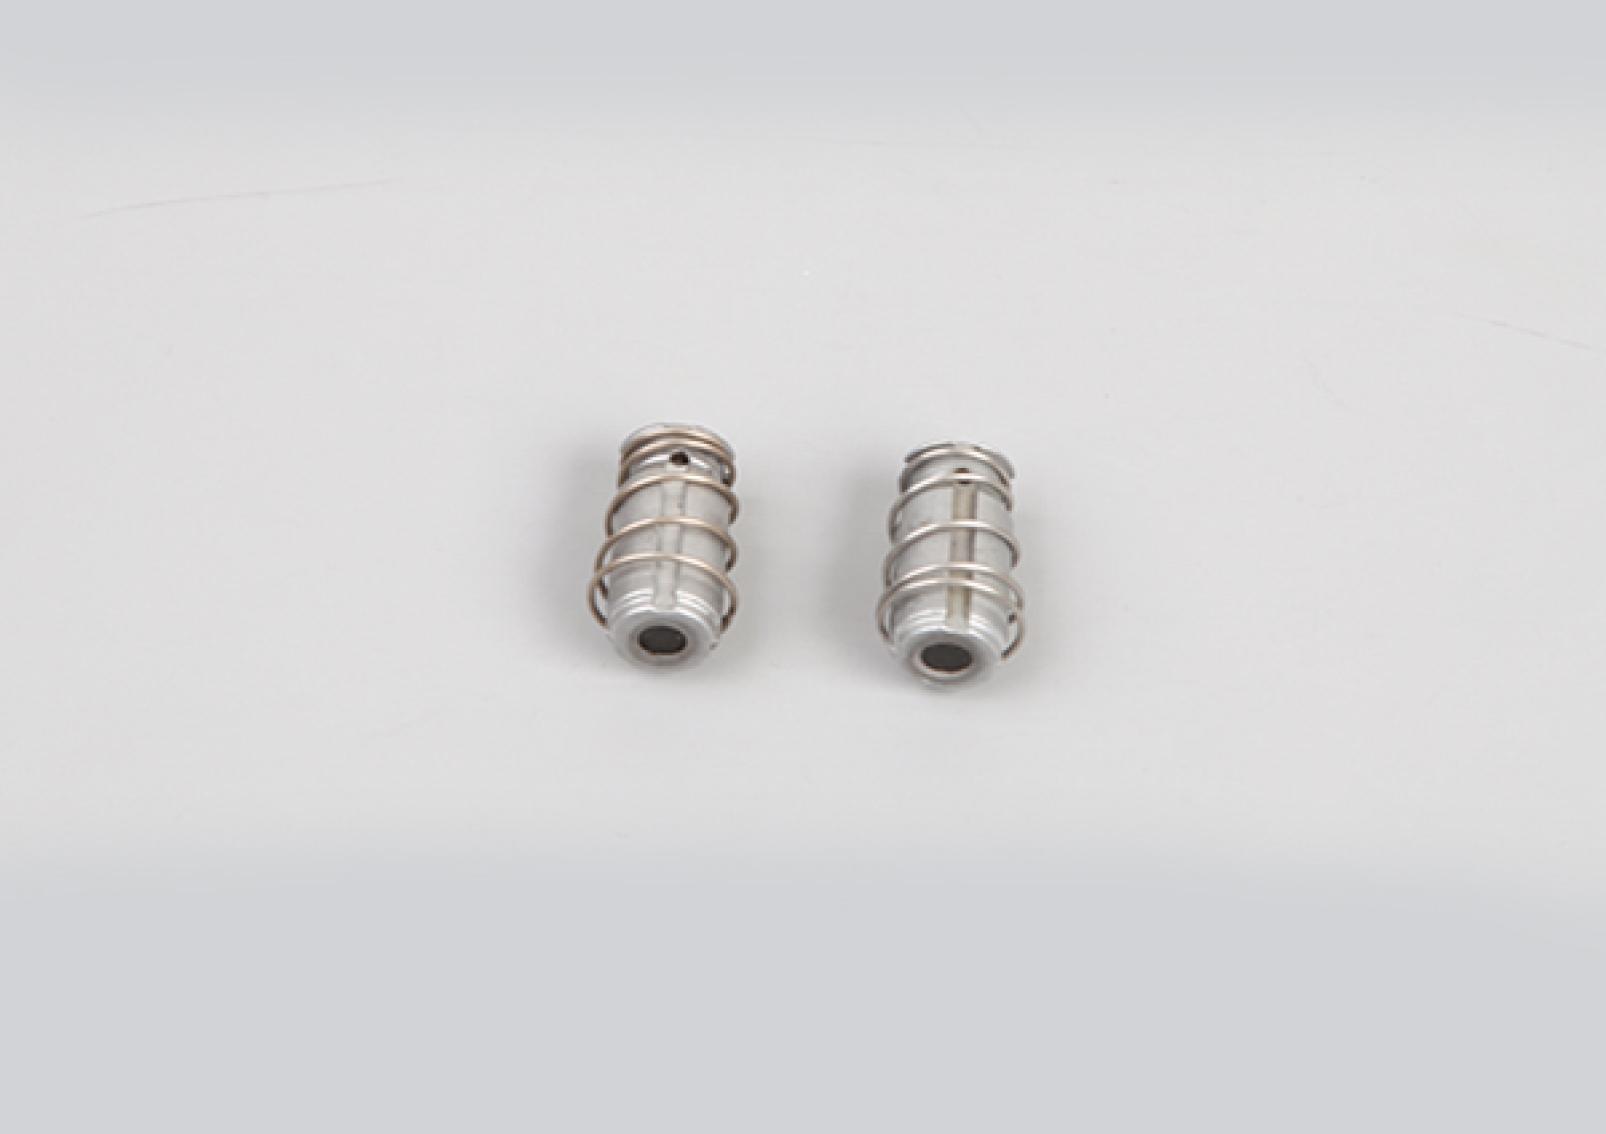 Gearbox Valve Repair Kit (Soft Valve), 4422302221